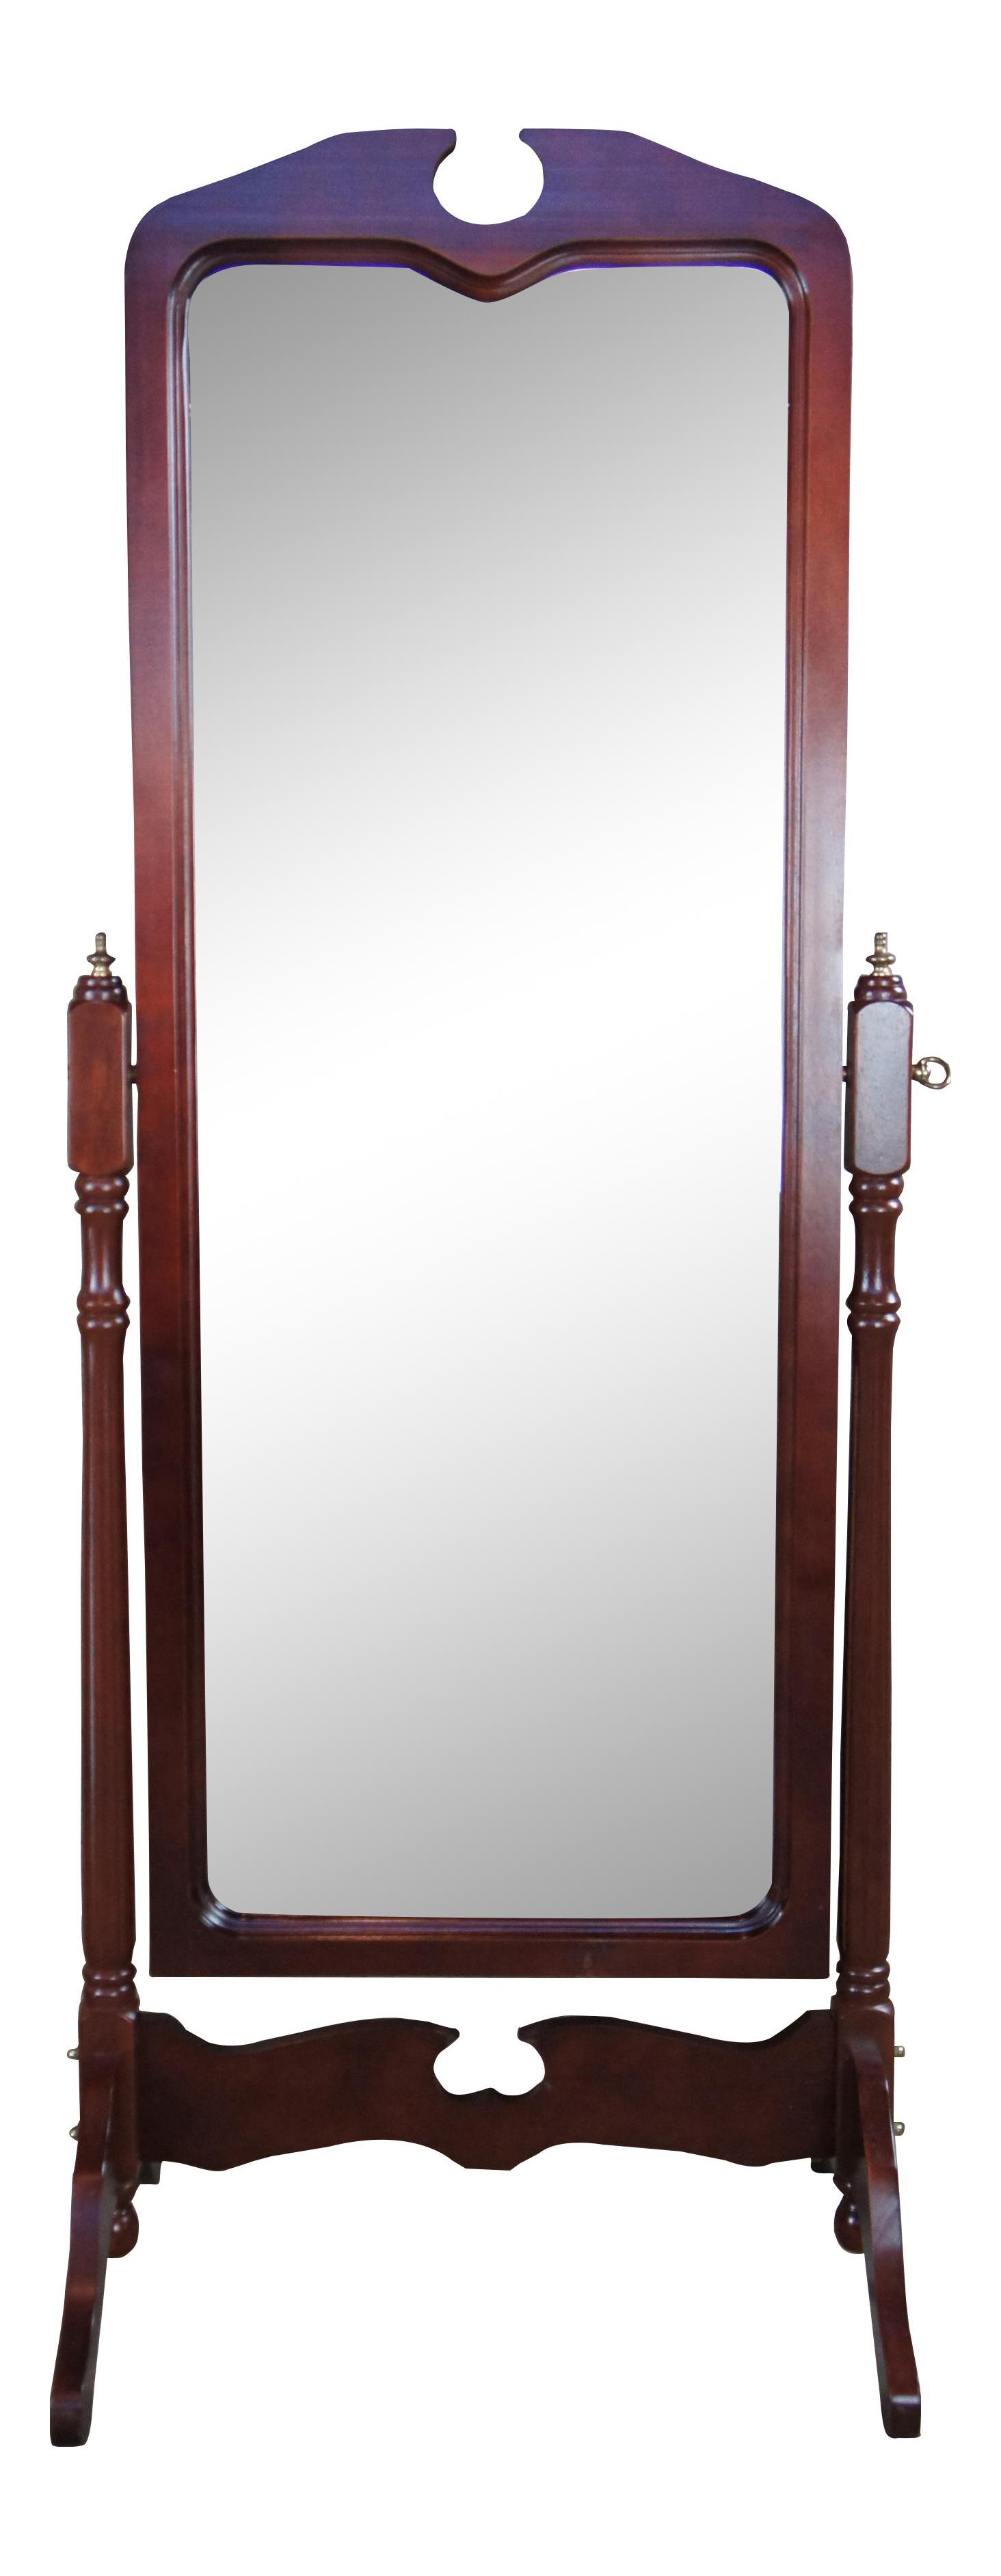 Late 20th Century Traditional Cheval Full Length Bedroom Dressing Standing Floor Vanity Mirror Chairish